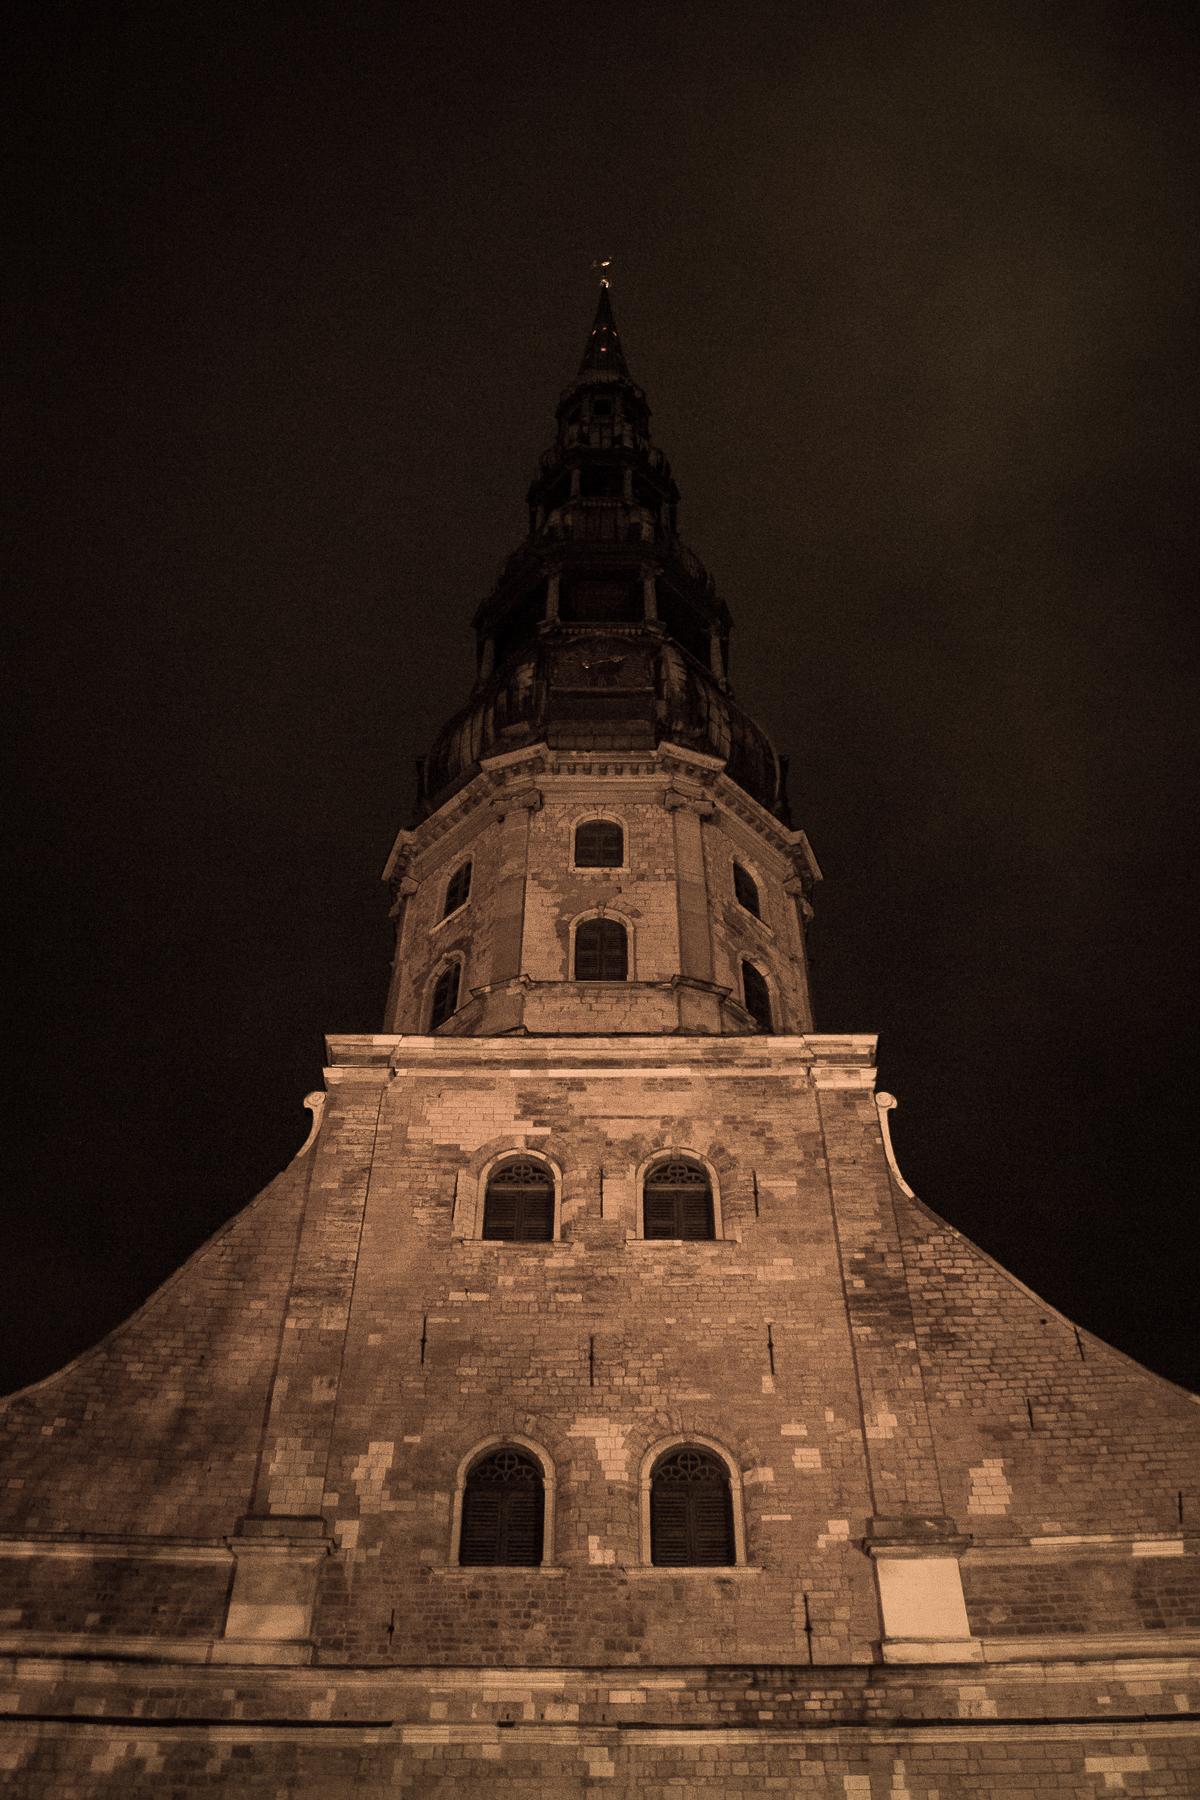 St. Peter'S Church Tower Via @Atisgailis